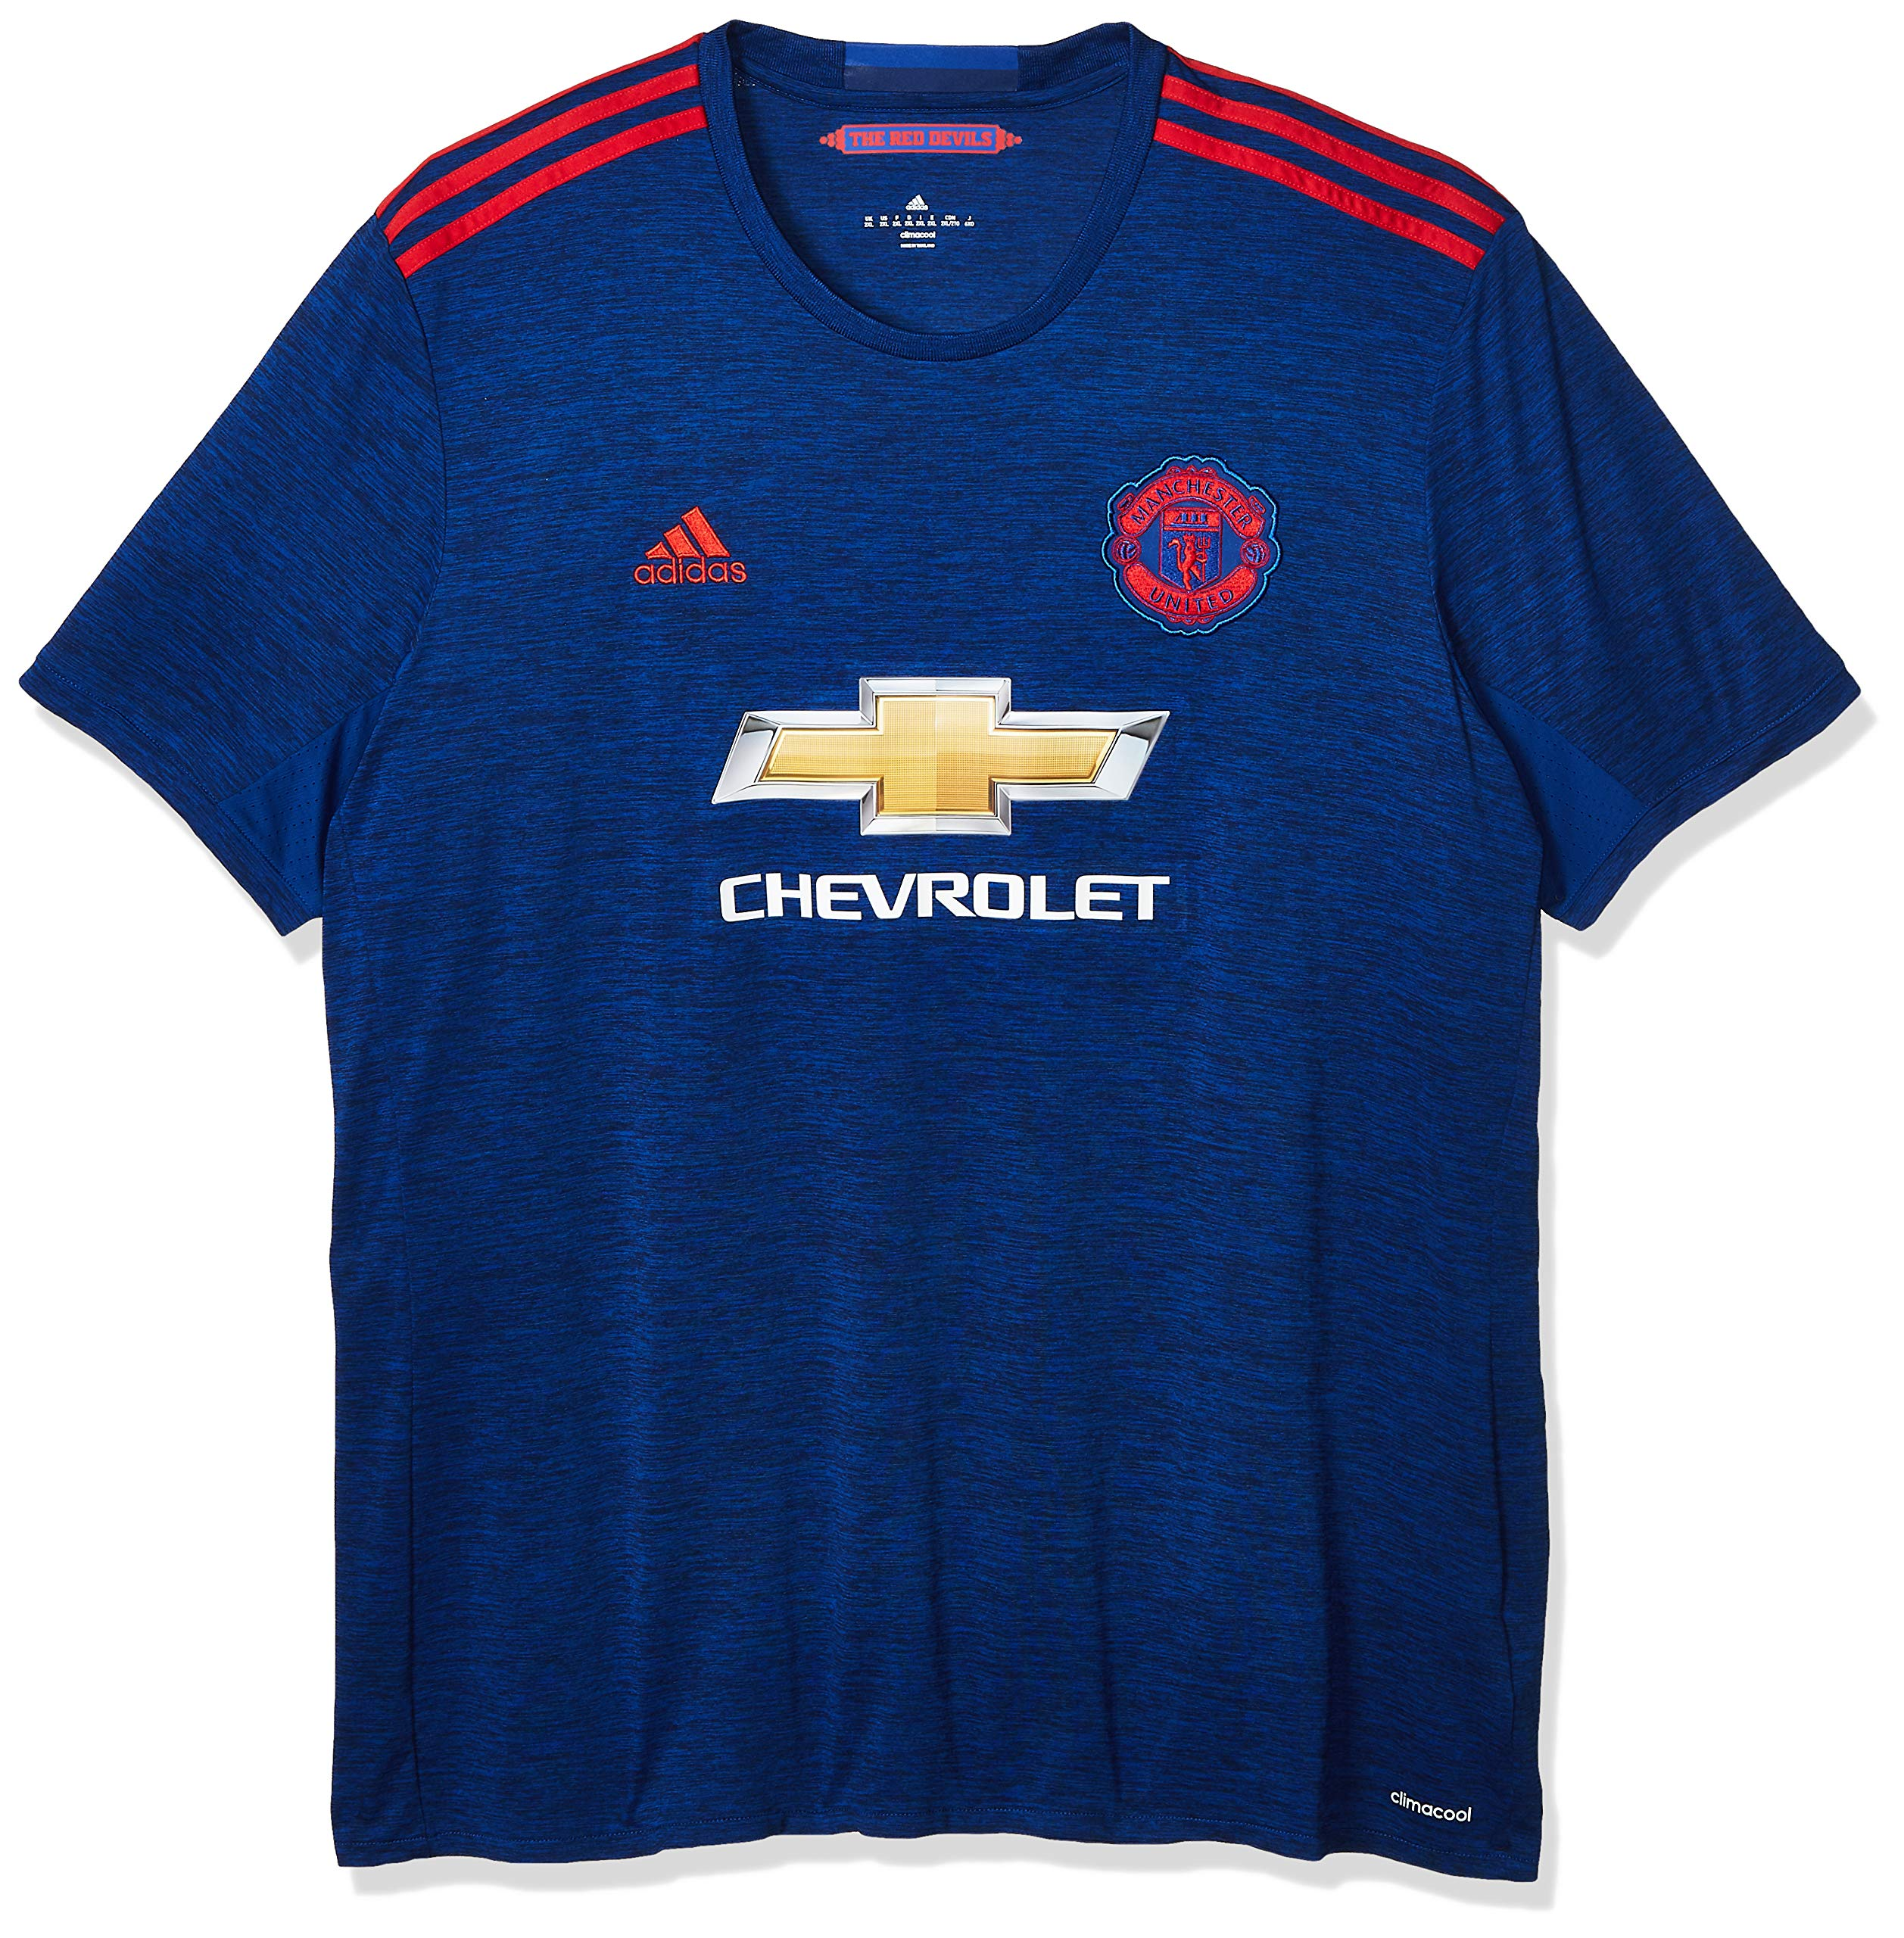 International Soccer Manchester United Men's Jersey, Medium, Blue/Red by adidas